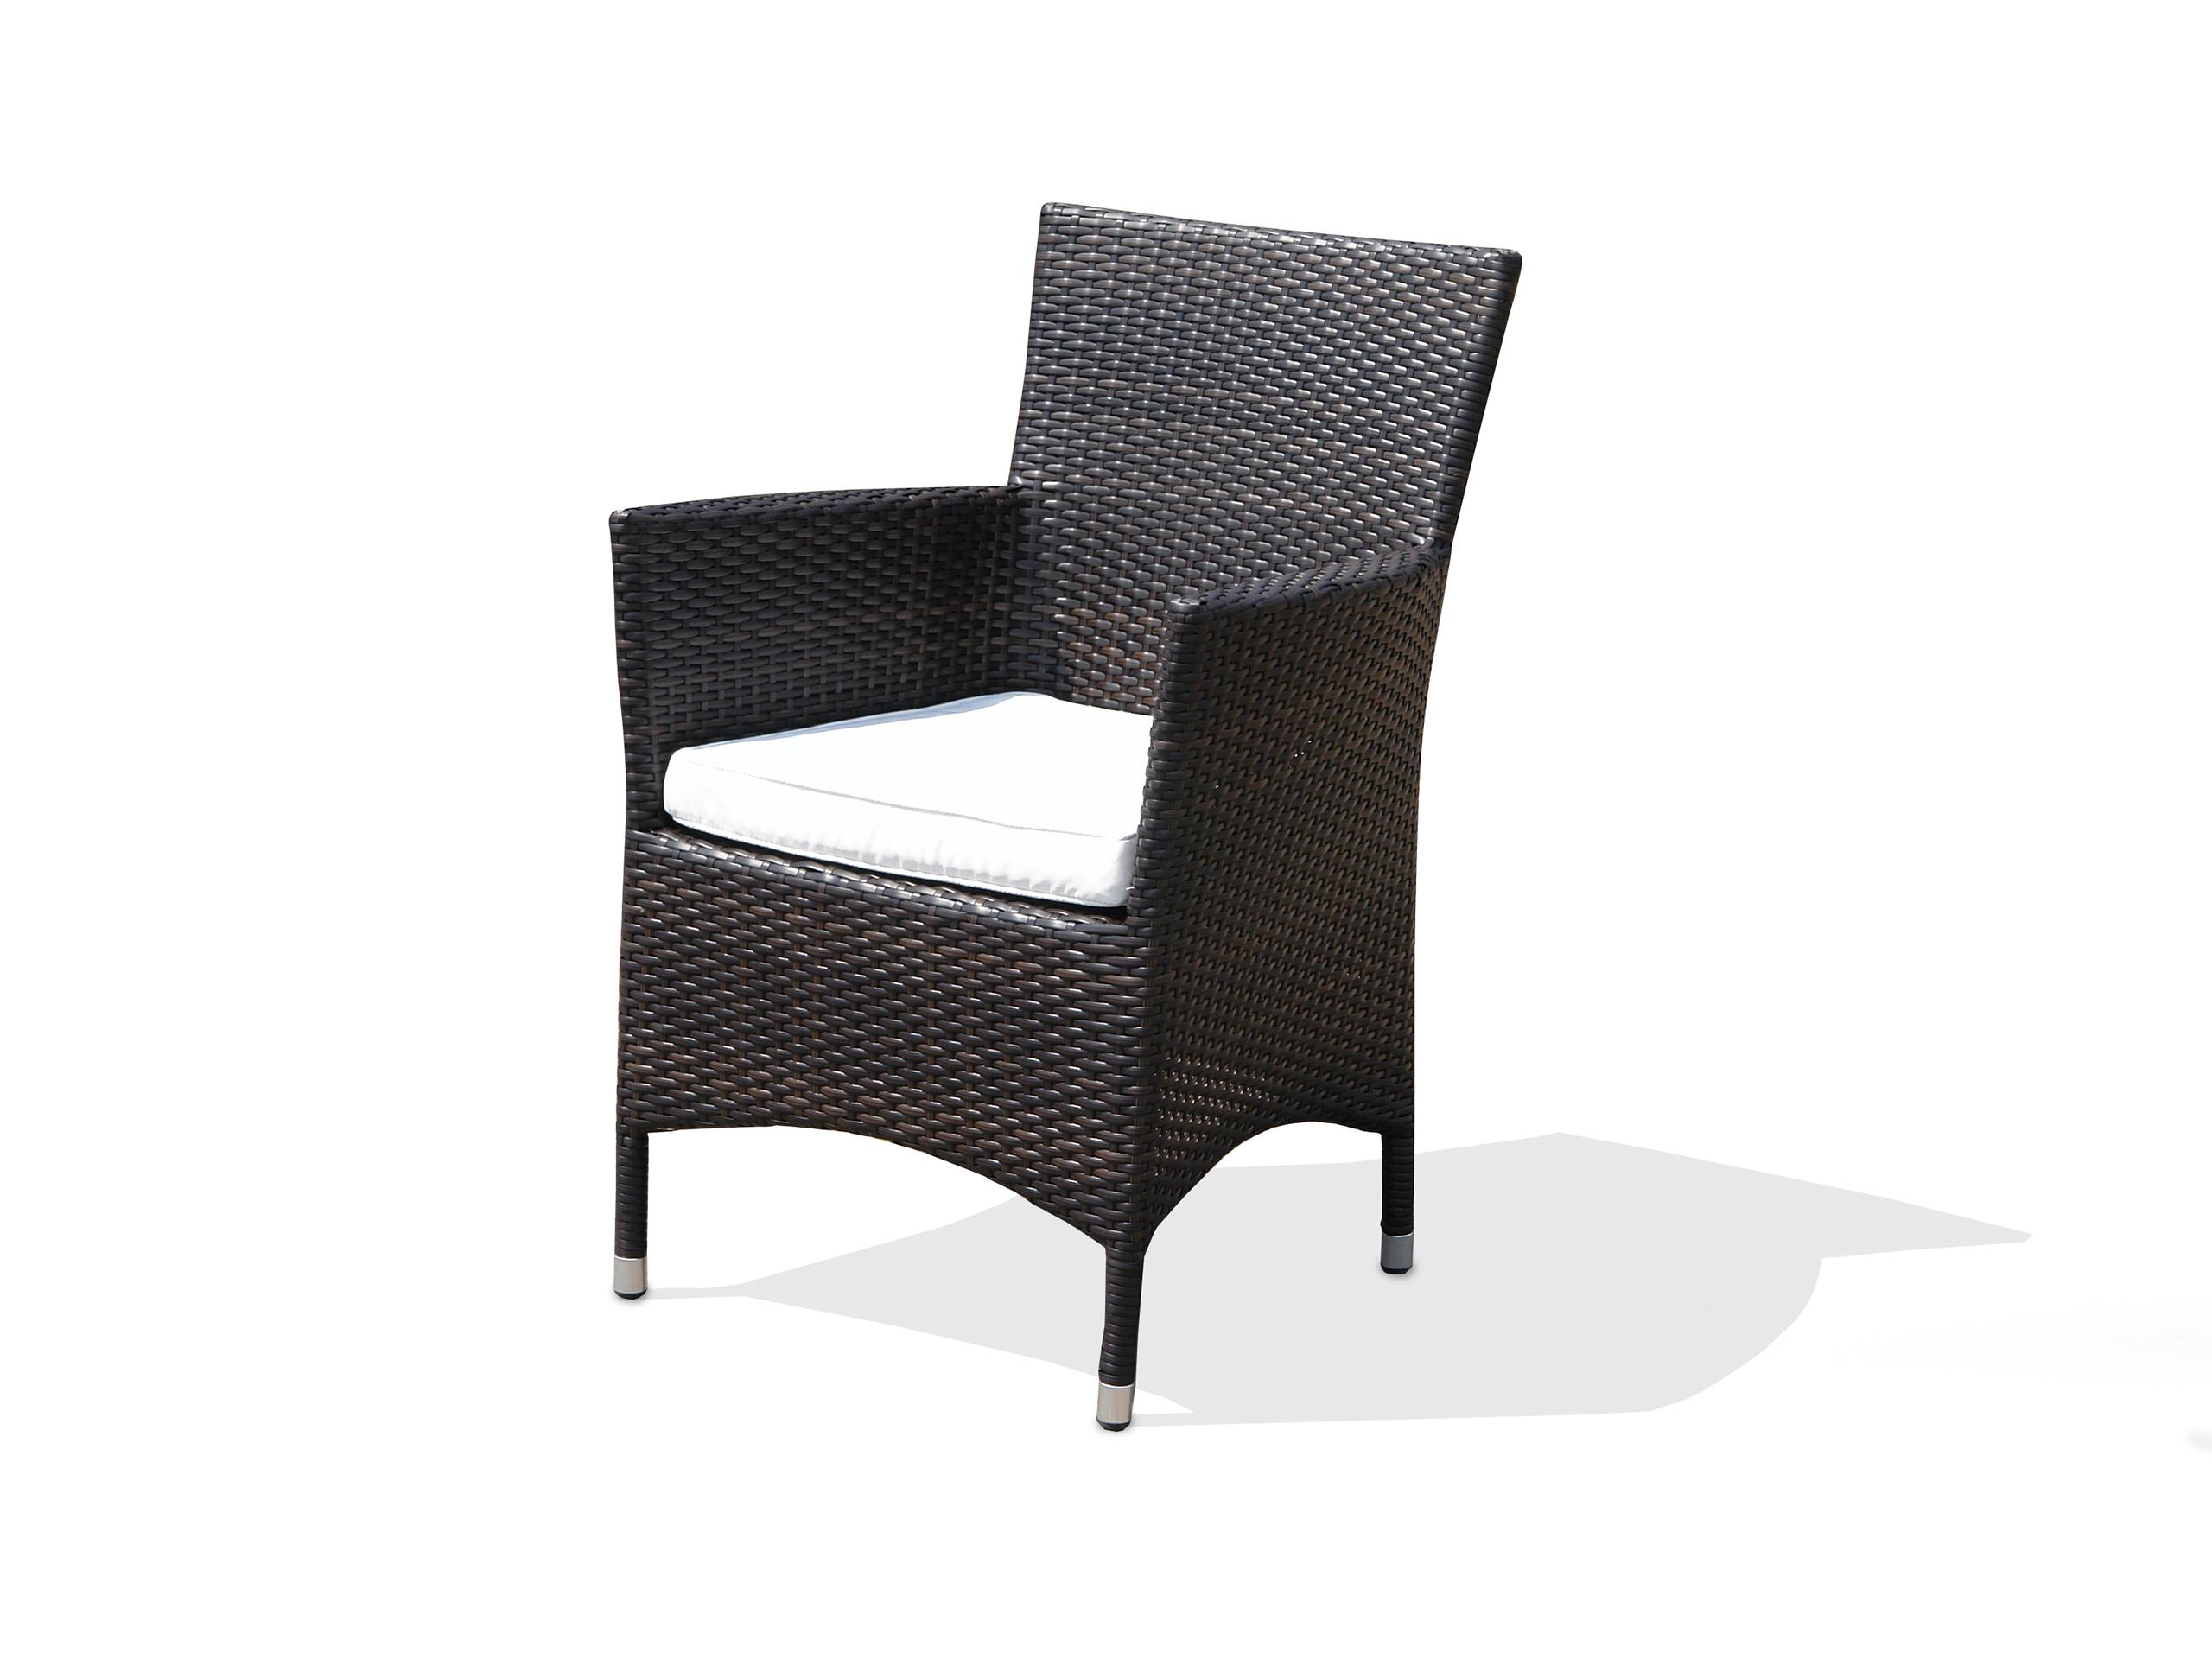 Meble Ogrodowe Krzeslo Rattan Ratan Italy 6862049690 Oficjalne